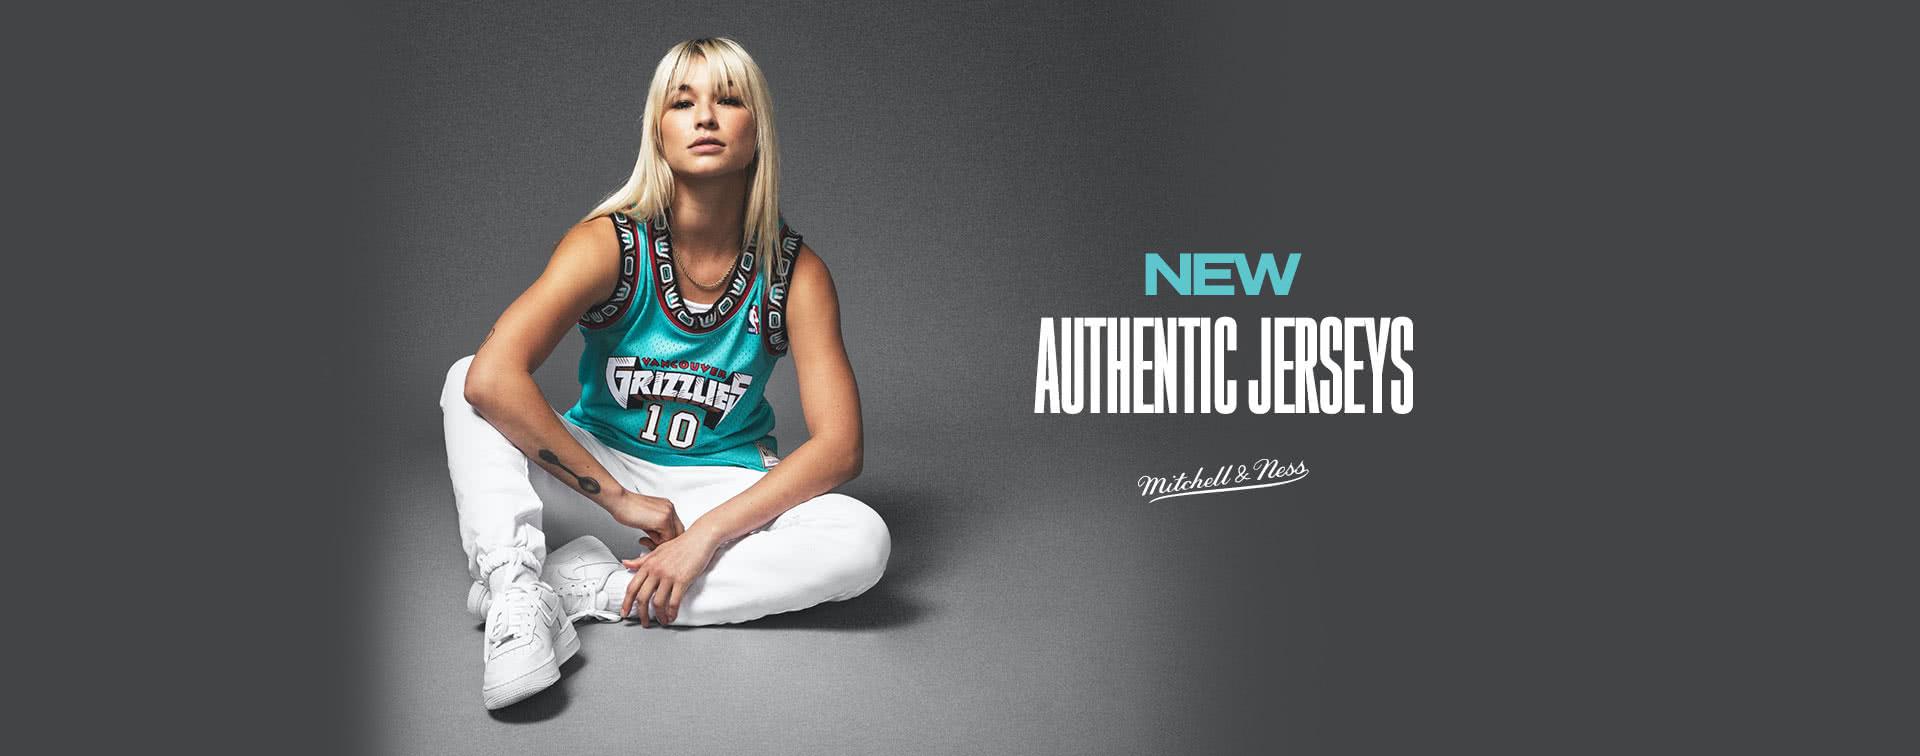 Mitchell & Ness baloncesto - Basket-Center